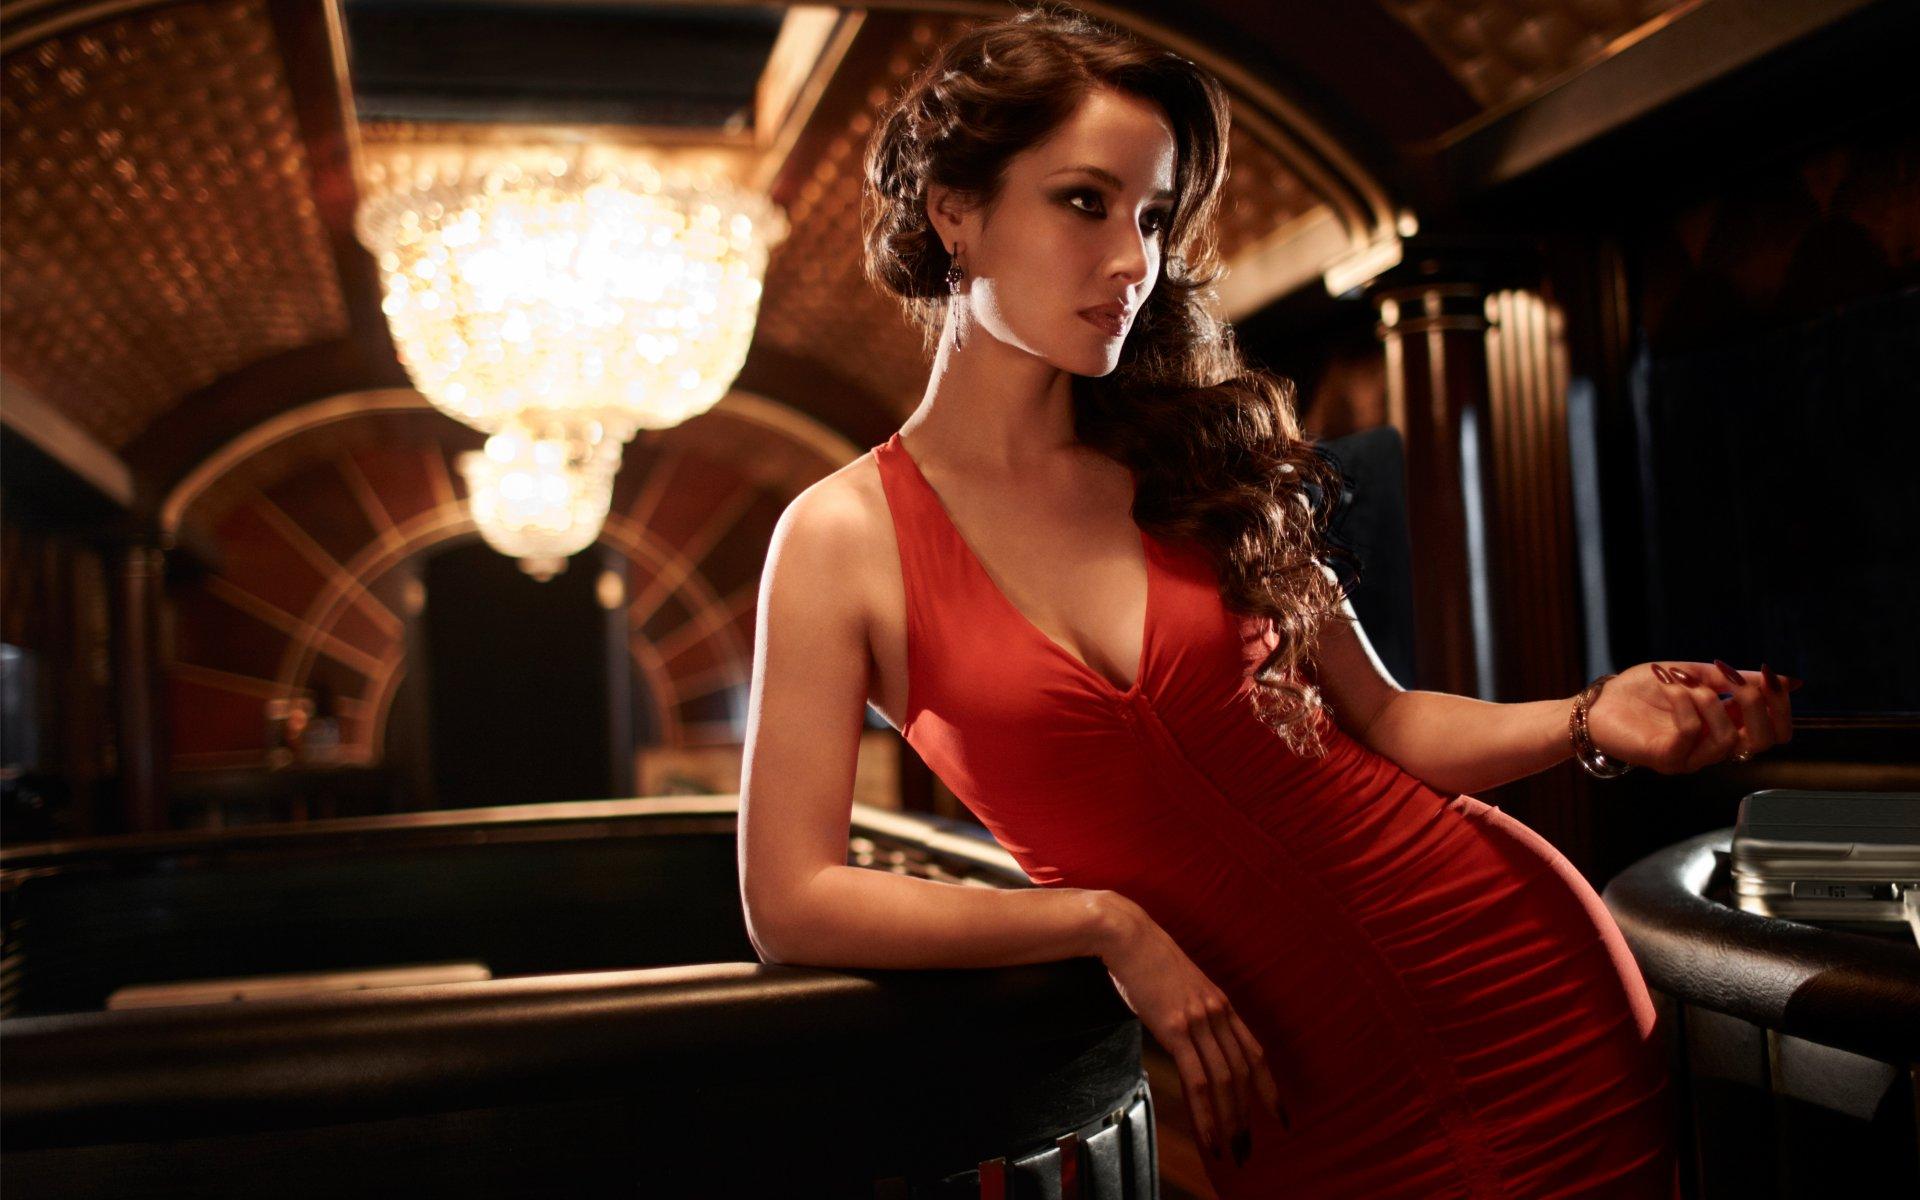 https://w-dog.ru/wallpapers/4/7/426069142530032/berenice-marlohe-berenis-marlo-devushka-bryunetka-aktrisa-model-krasnoe-plate-vyrez-dekolte-film-007-james-bond-dzhejms-bond-skyfall.jpg